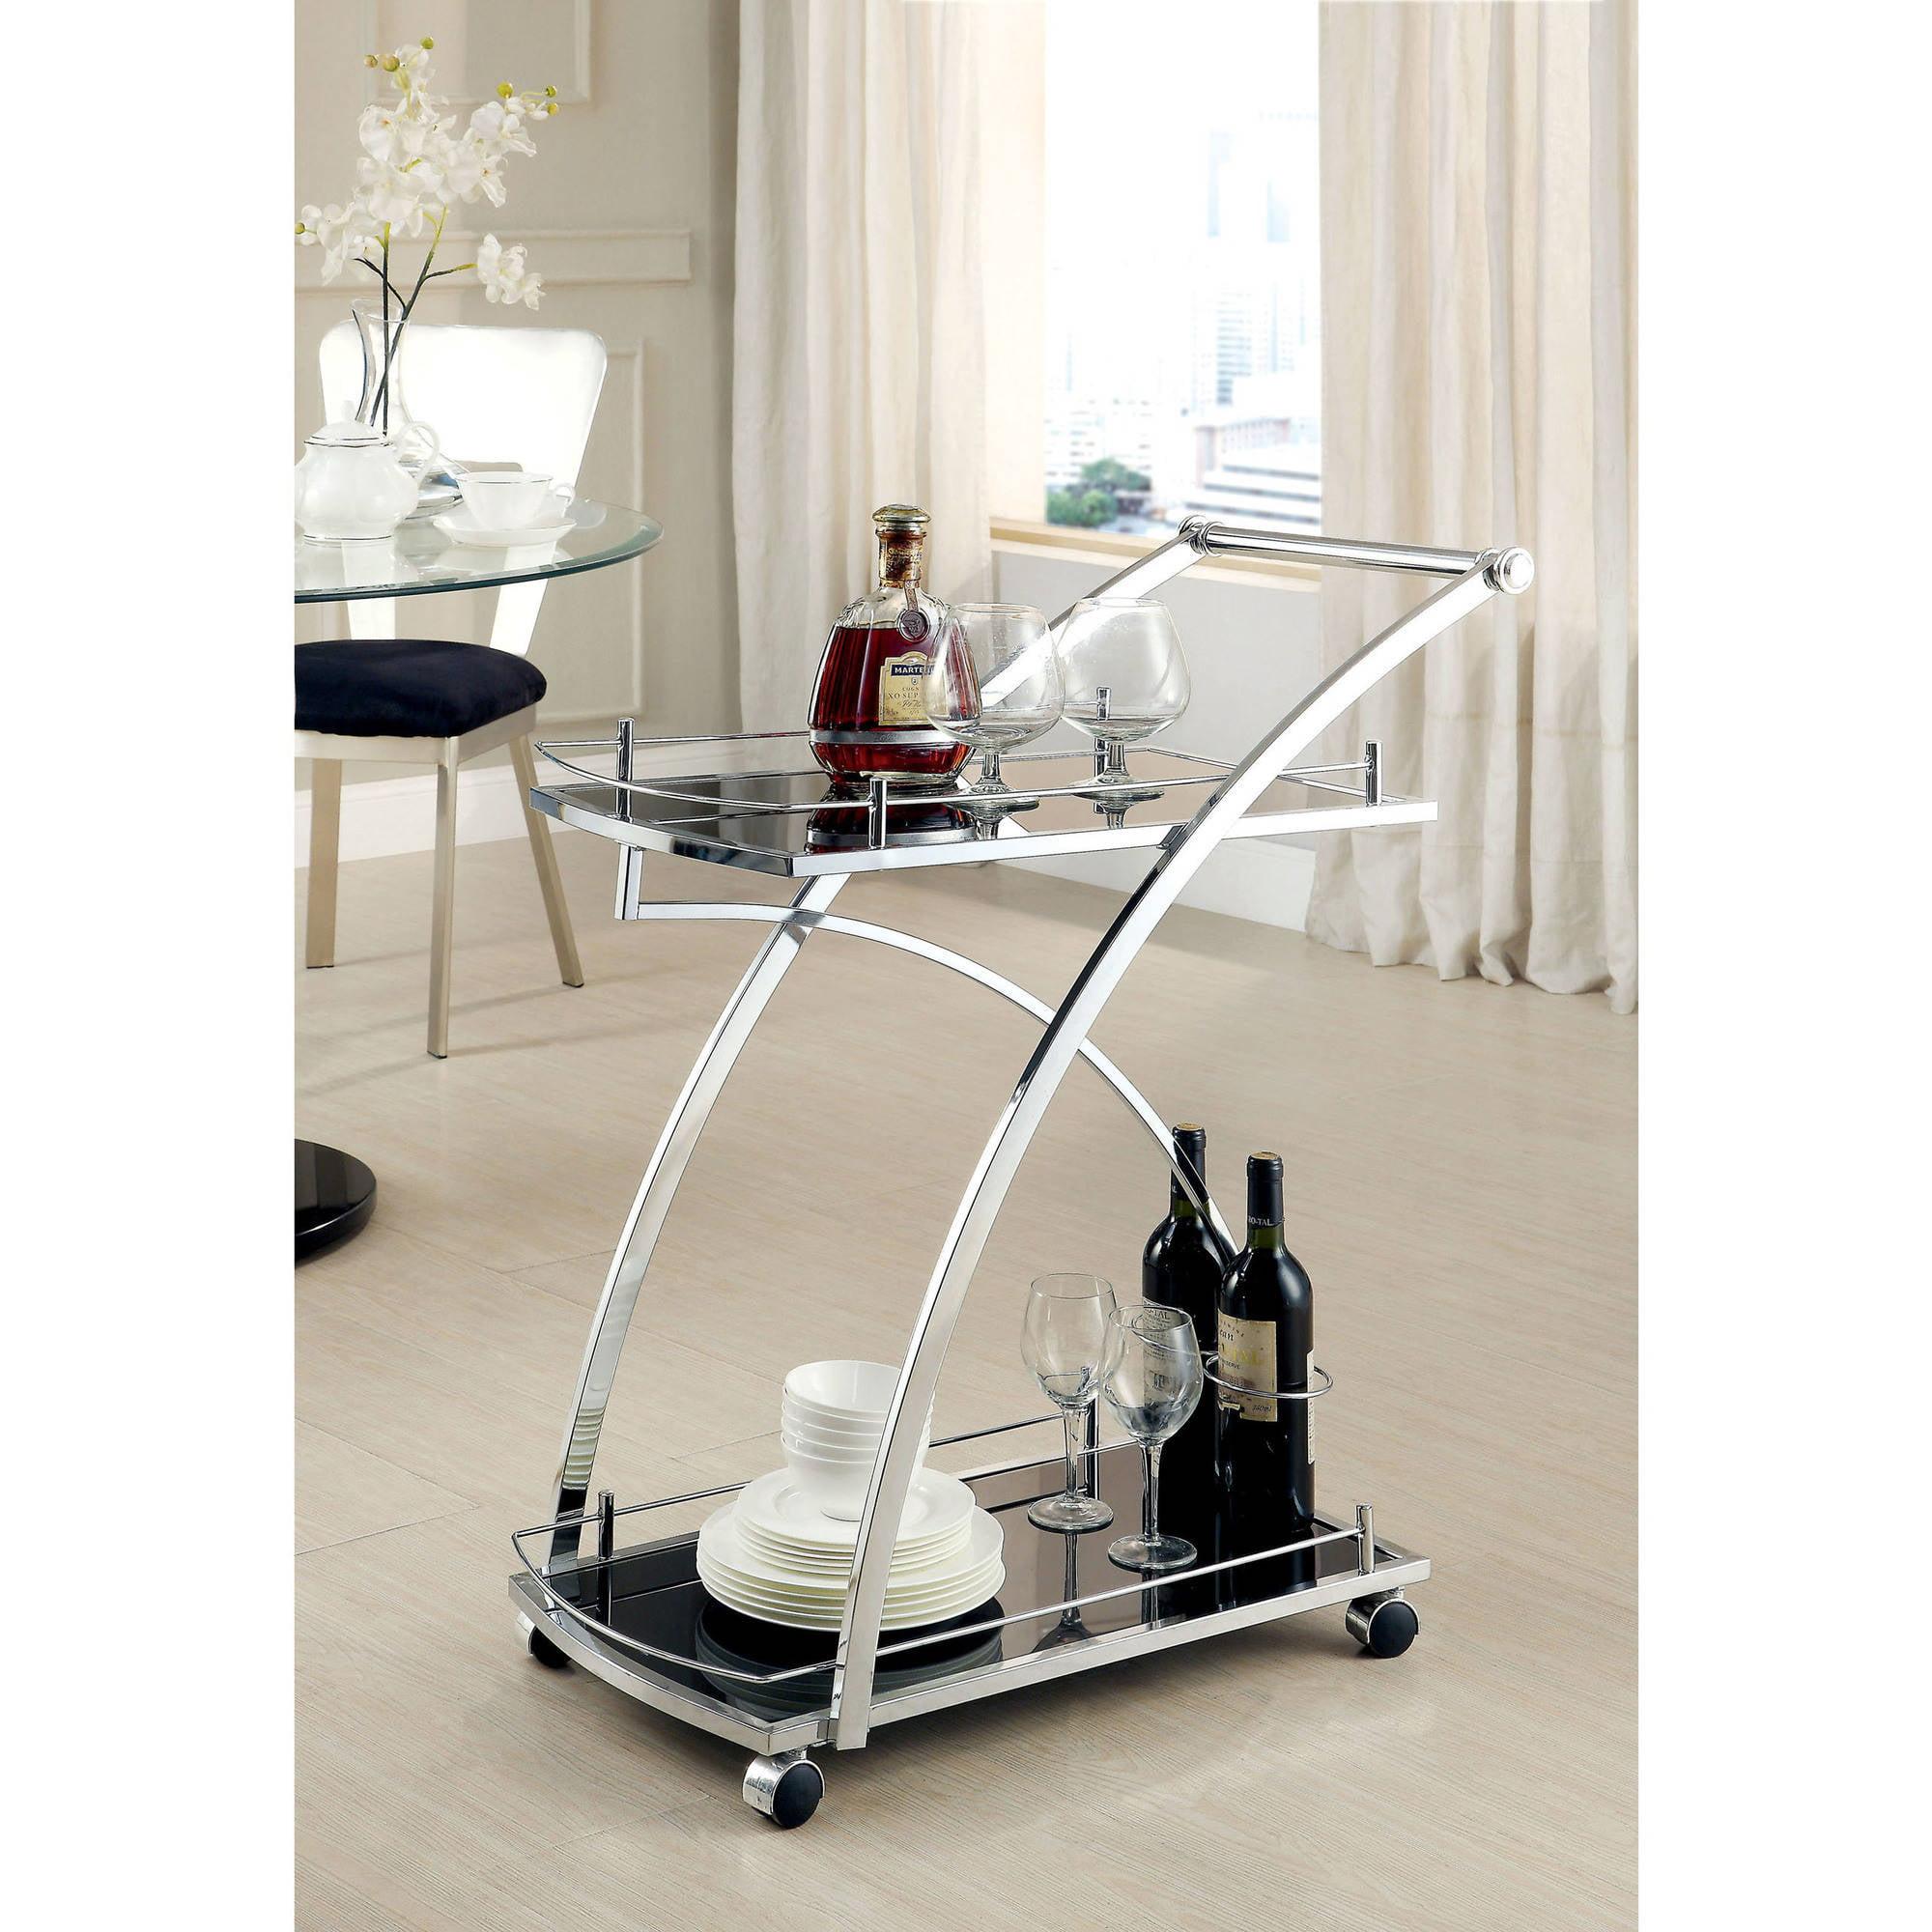 Furniture of America Ingle Modern 2-Shelf Serving Cart, Chrome